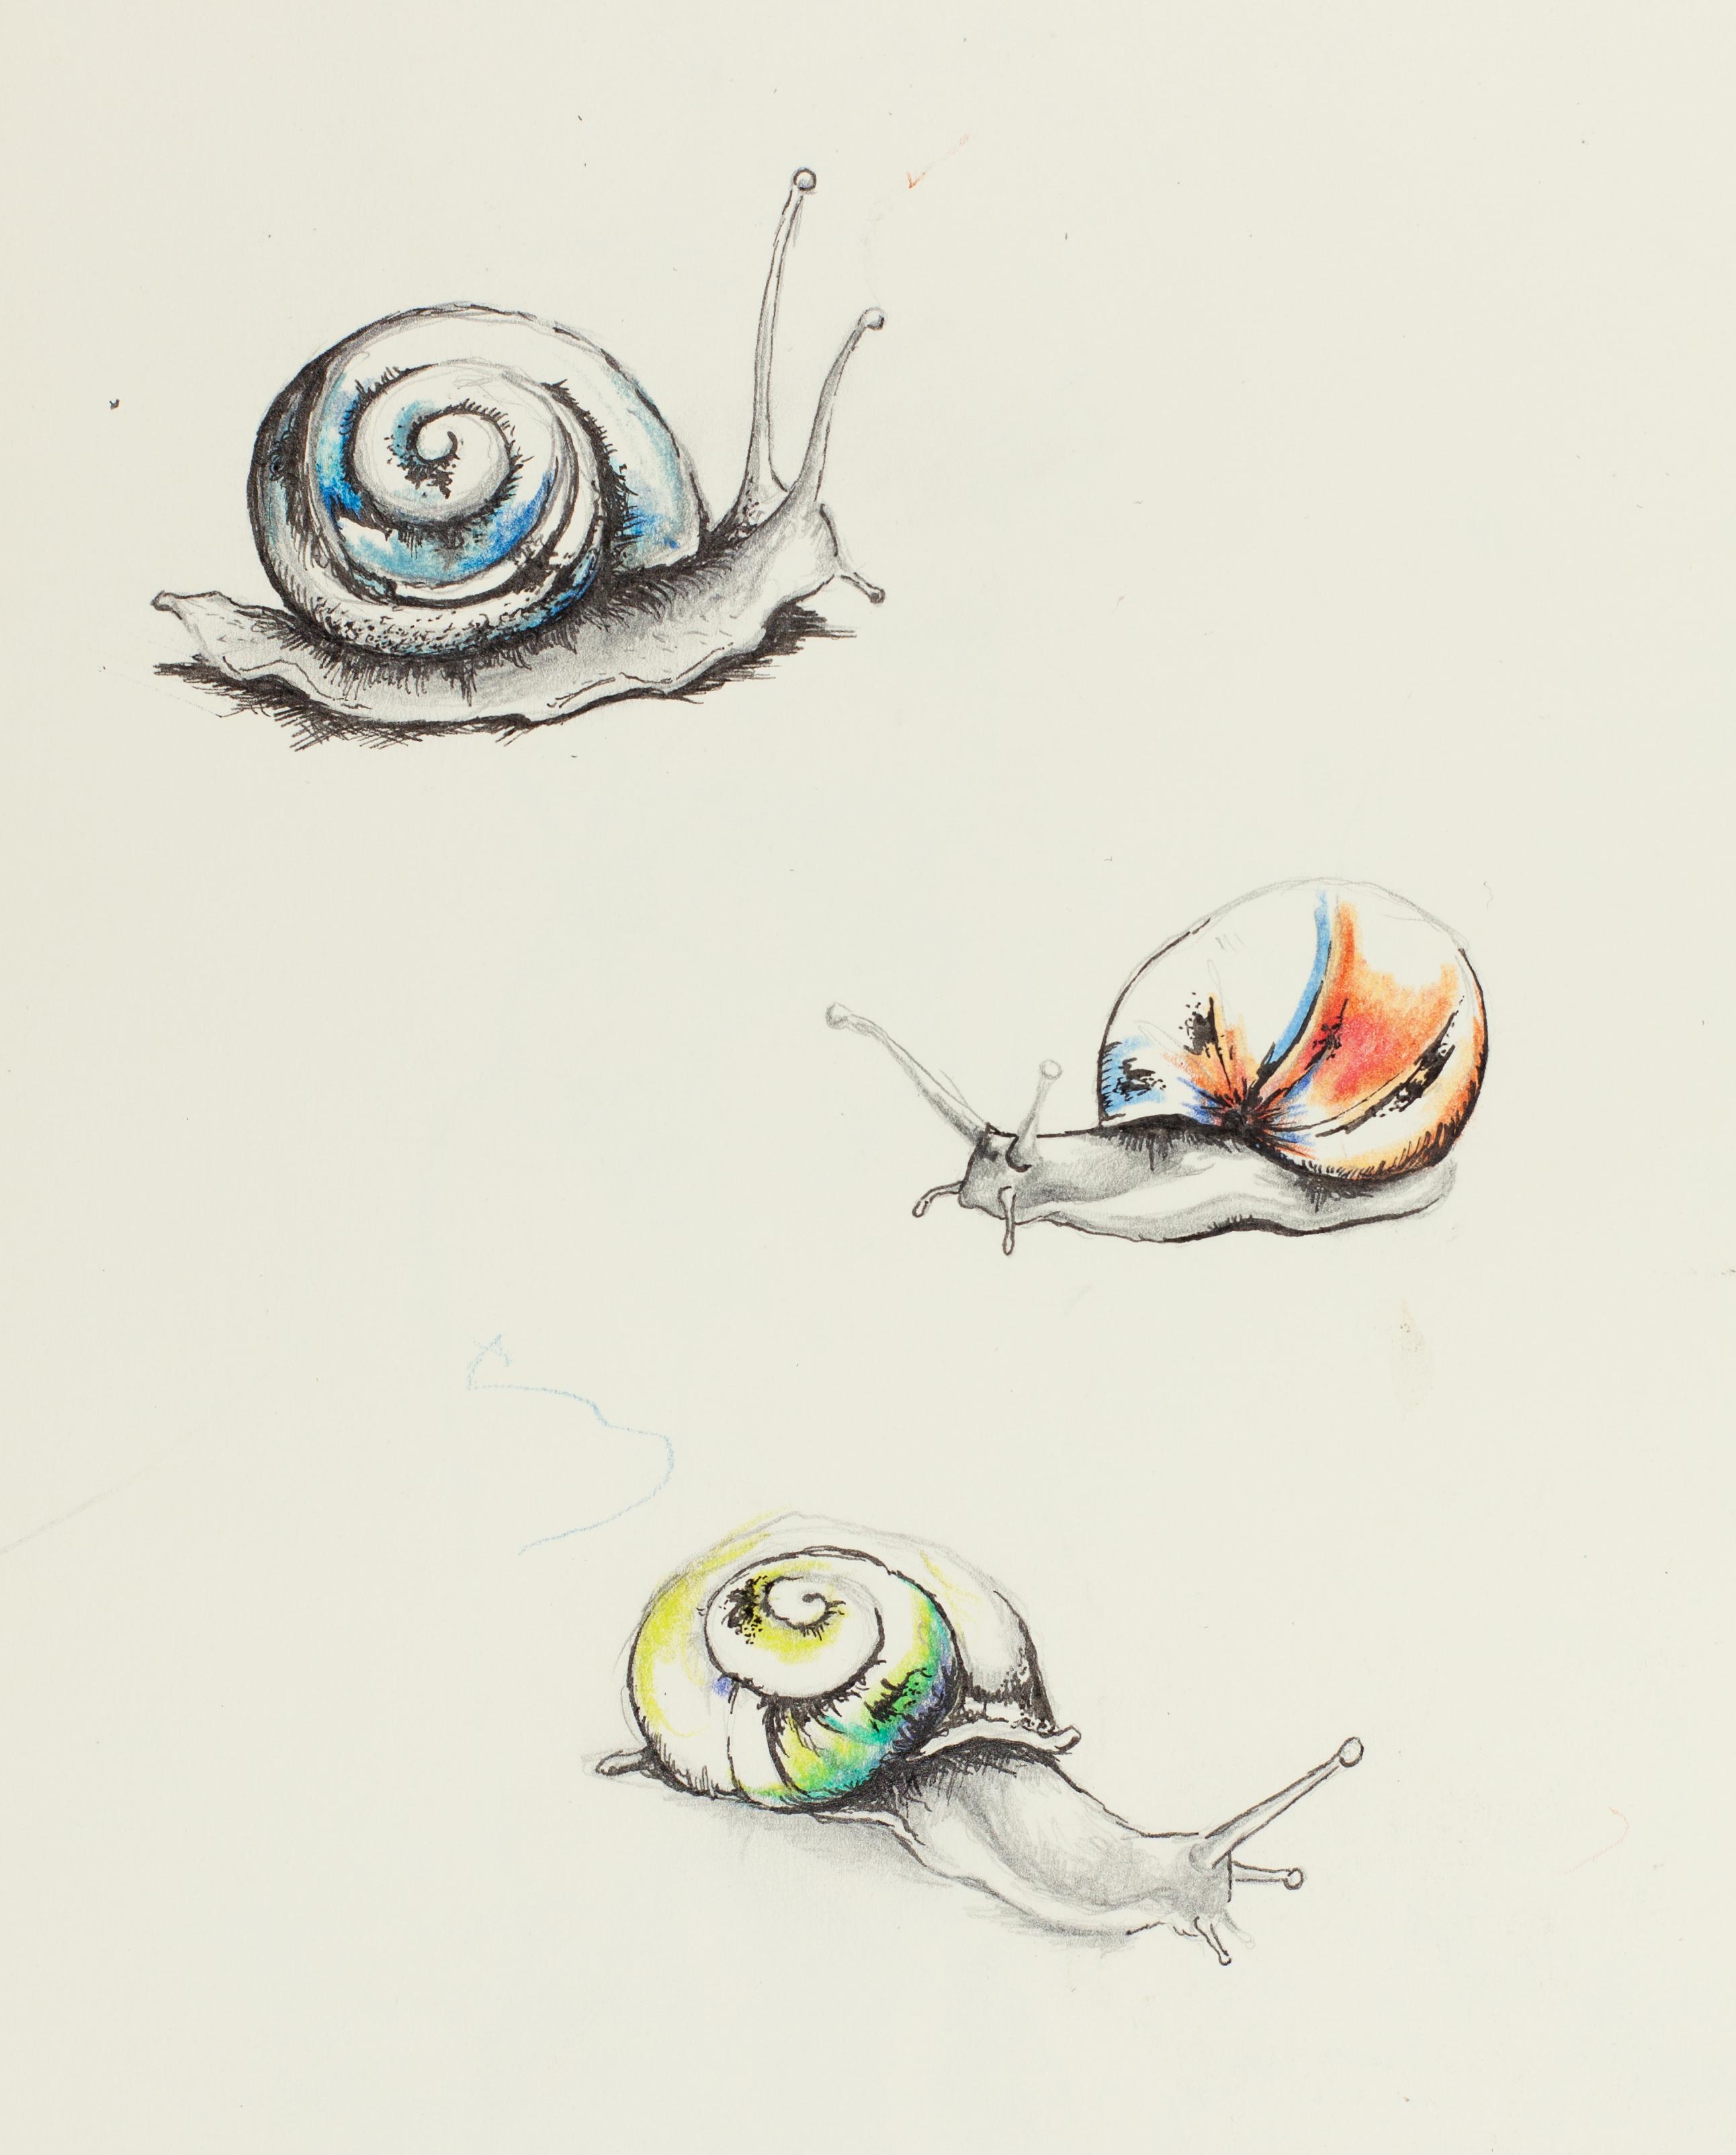 Pencil carrolyn lakowski illustration for Simple snail drawing